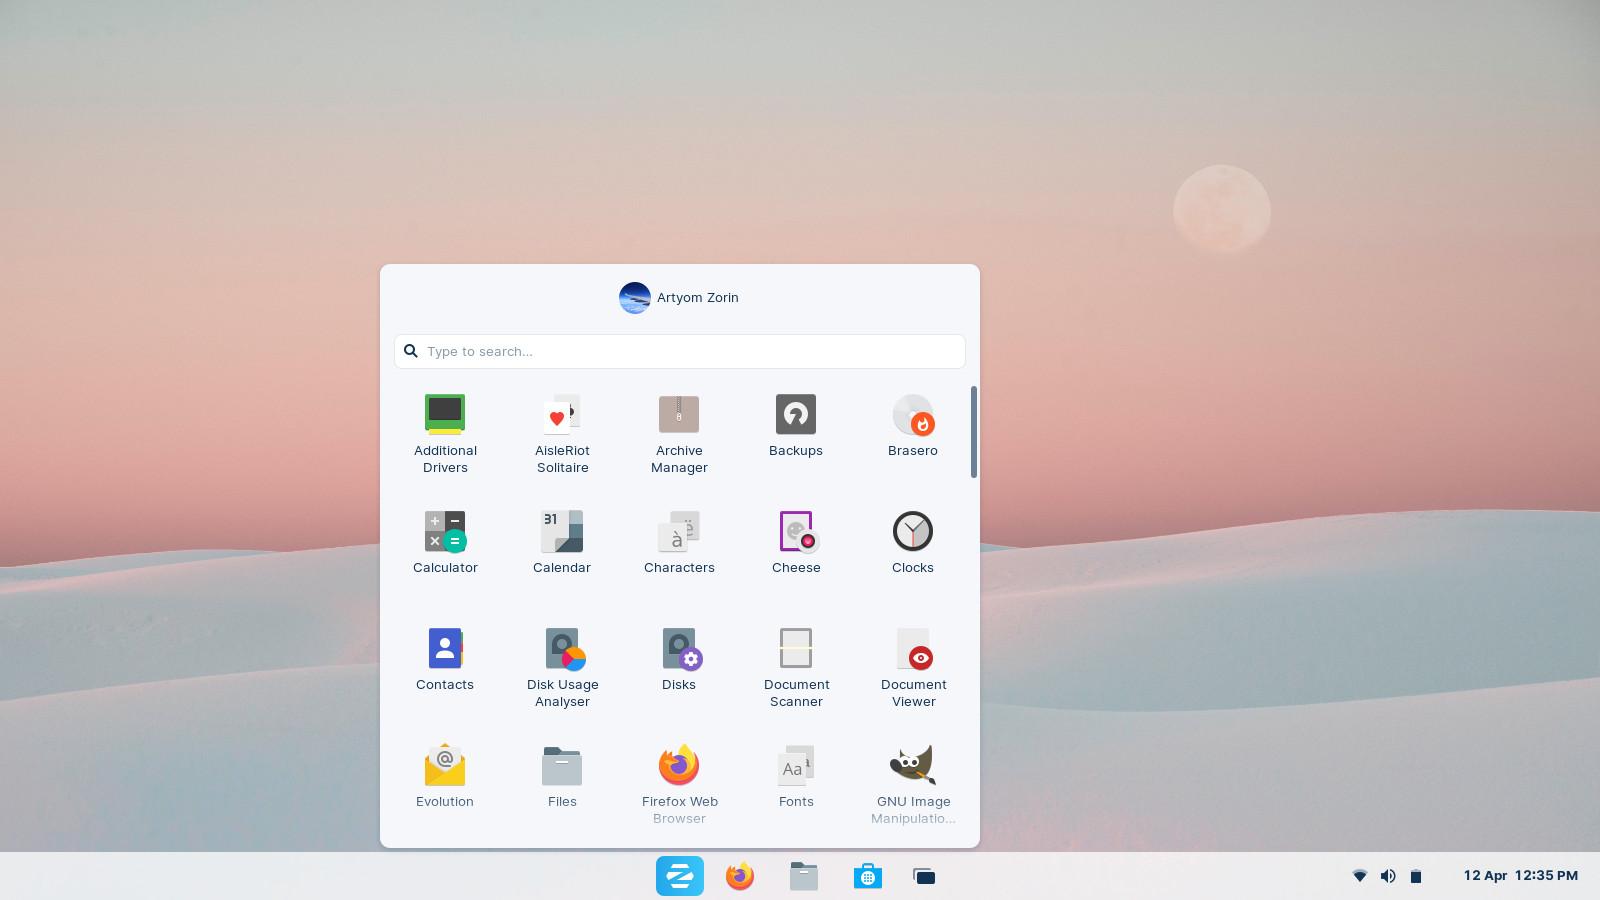 Zorin OS 16 ScreenShot Provided By Zorin OS Team